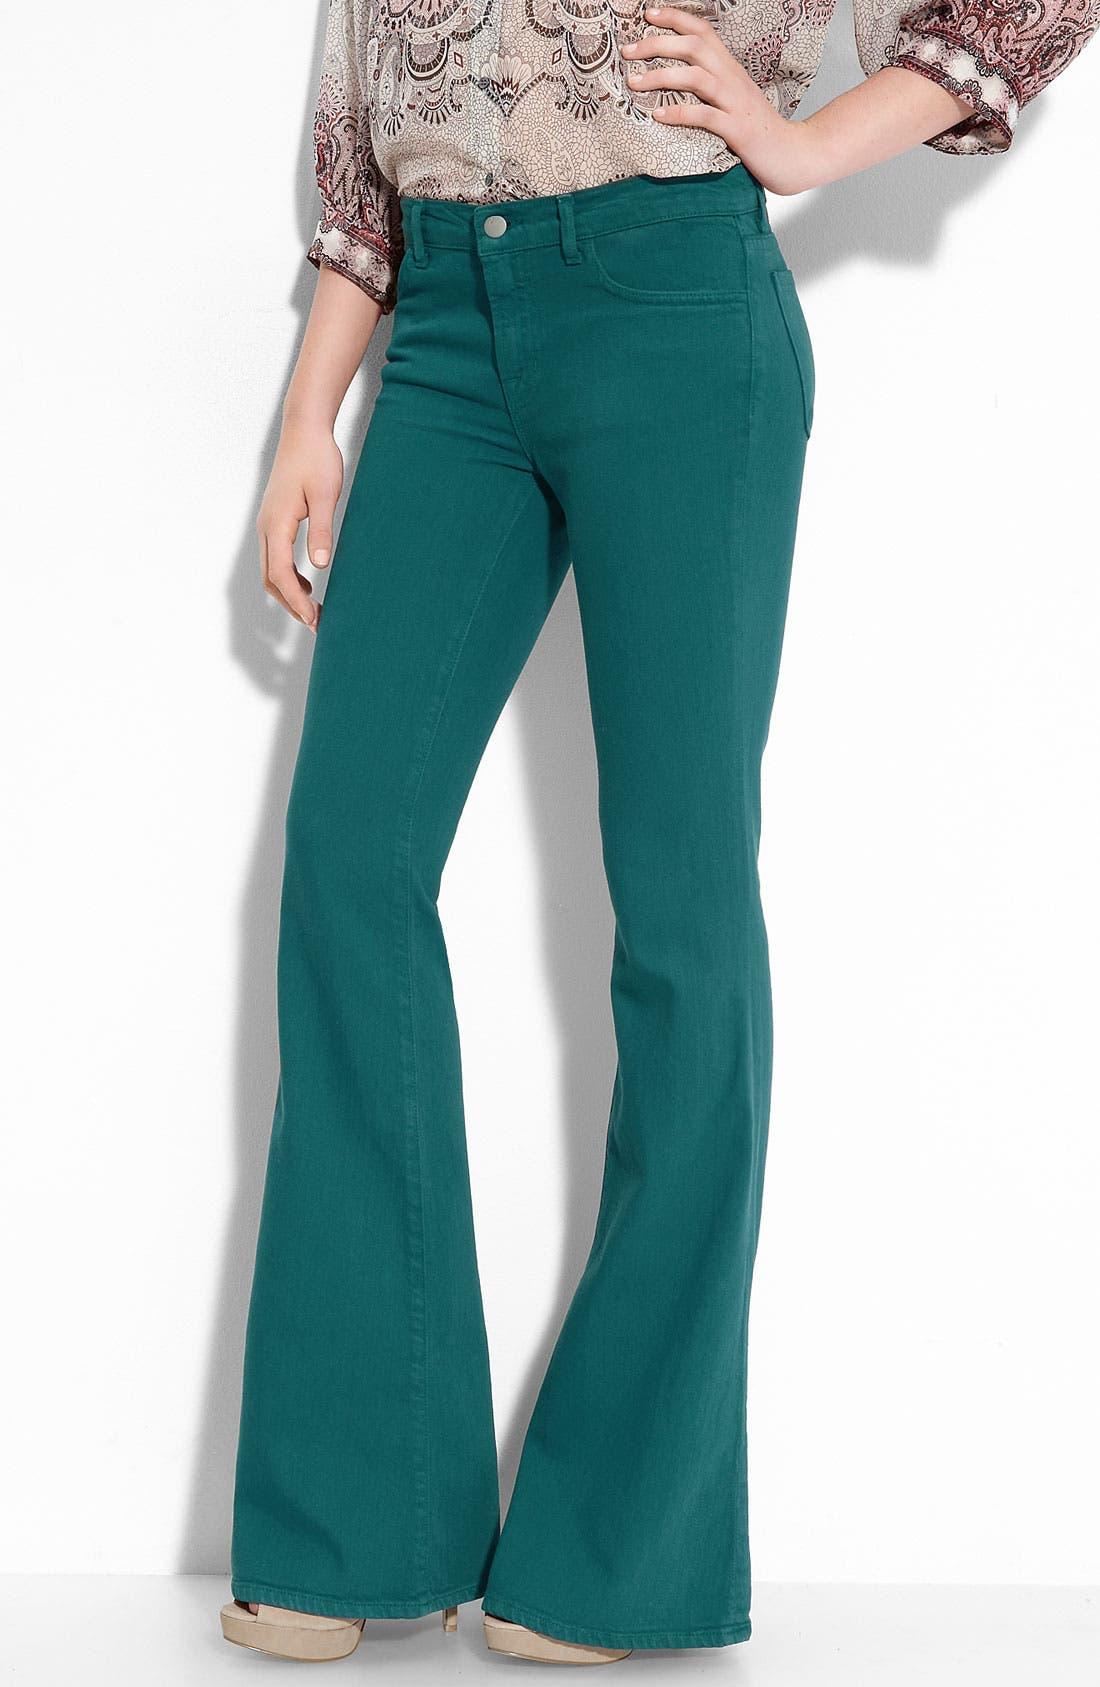 Main Image - J Brand Mid Rise Flare Leg Stretch Jeans